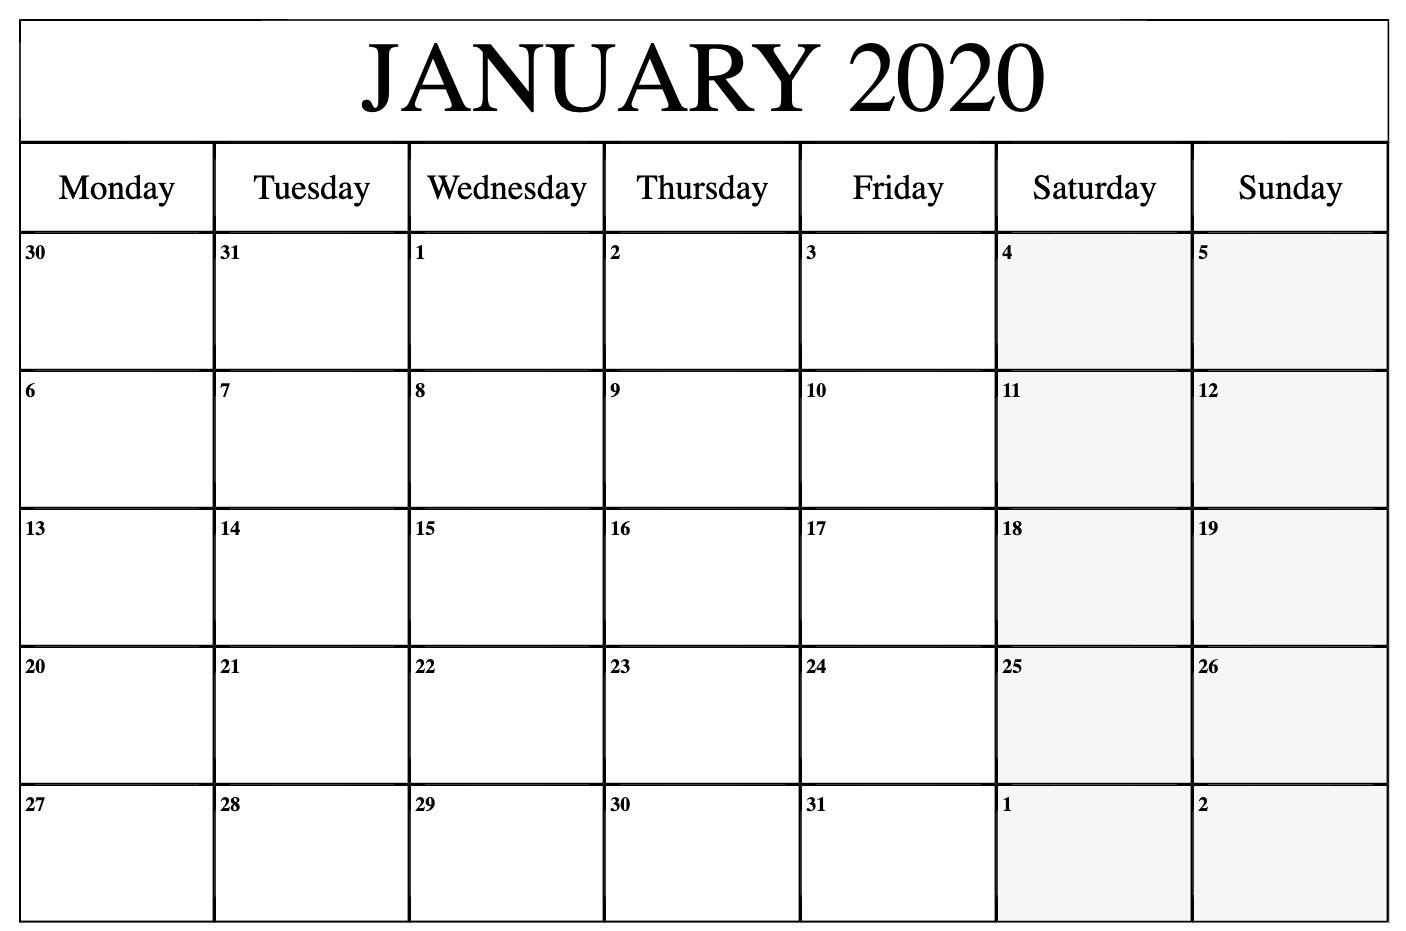 January 2020 Calendar Printable Monday